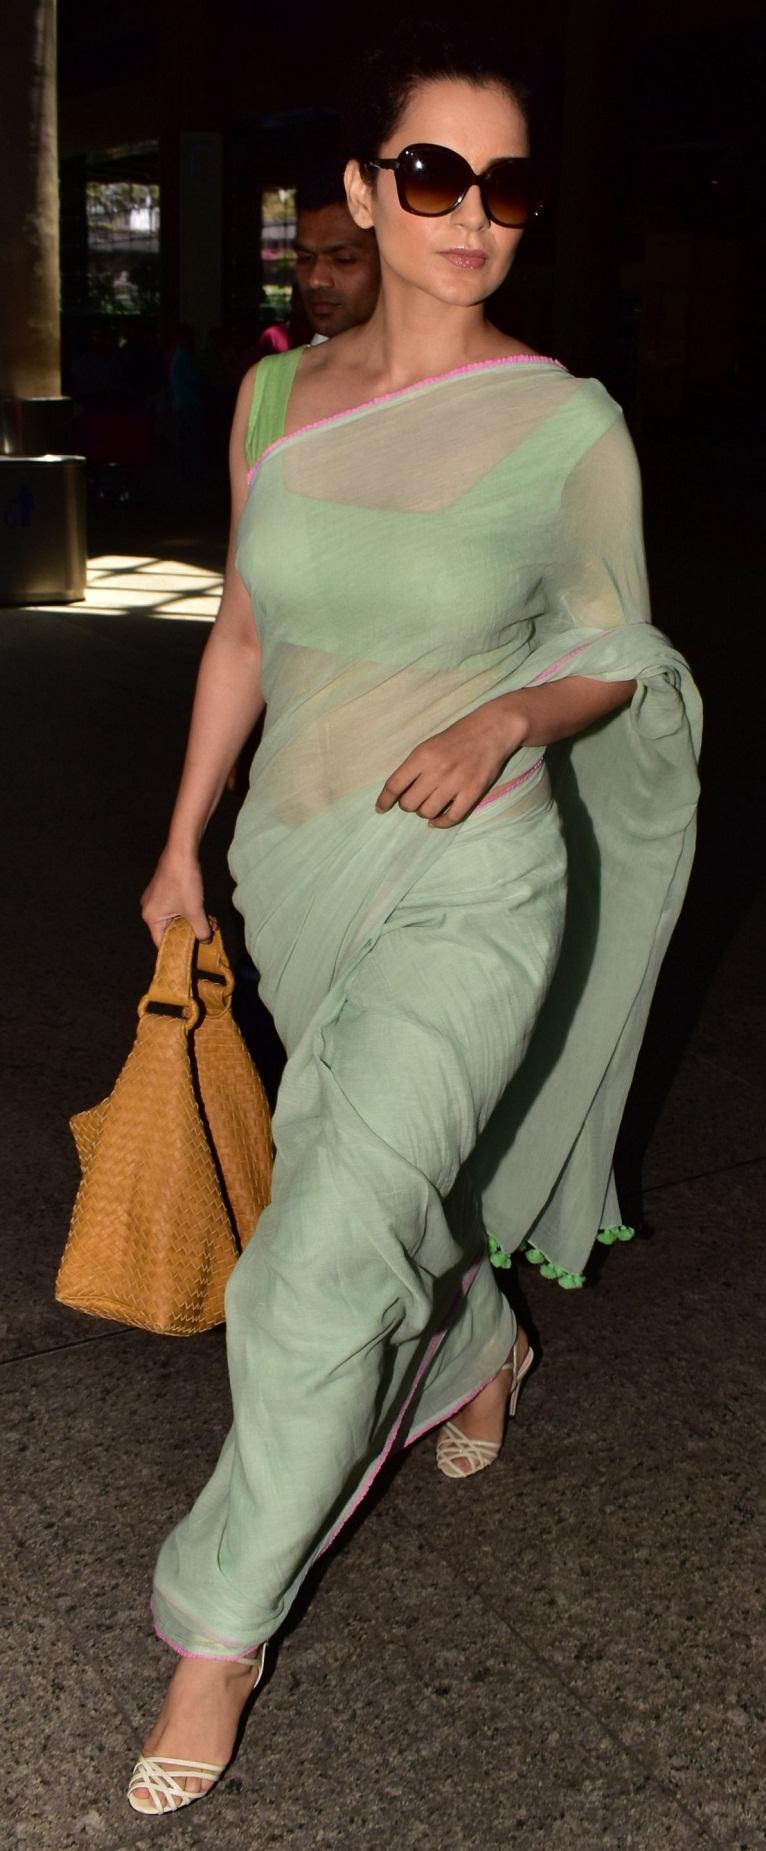 Bollywood Tadka, अमीषा पटेल इमेज, अमीषा पटेल फोटो, अमीषा पटेल पिक्चर, कंगना रनौत इमेज, कंगना रनौत फोटो, कंगना रनौत पिक्चर